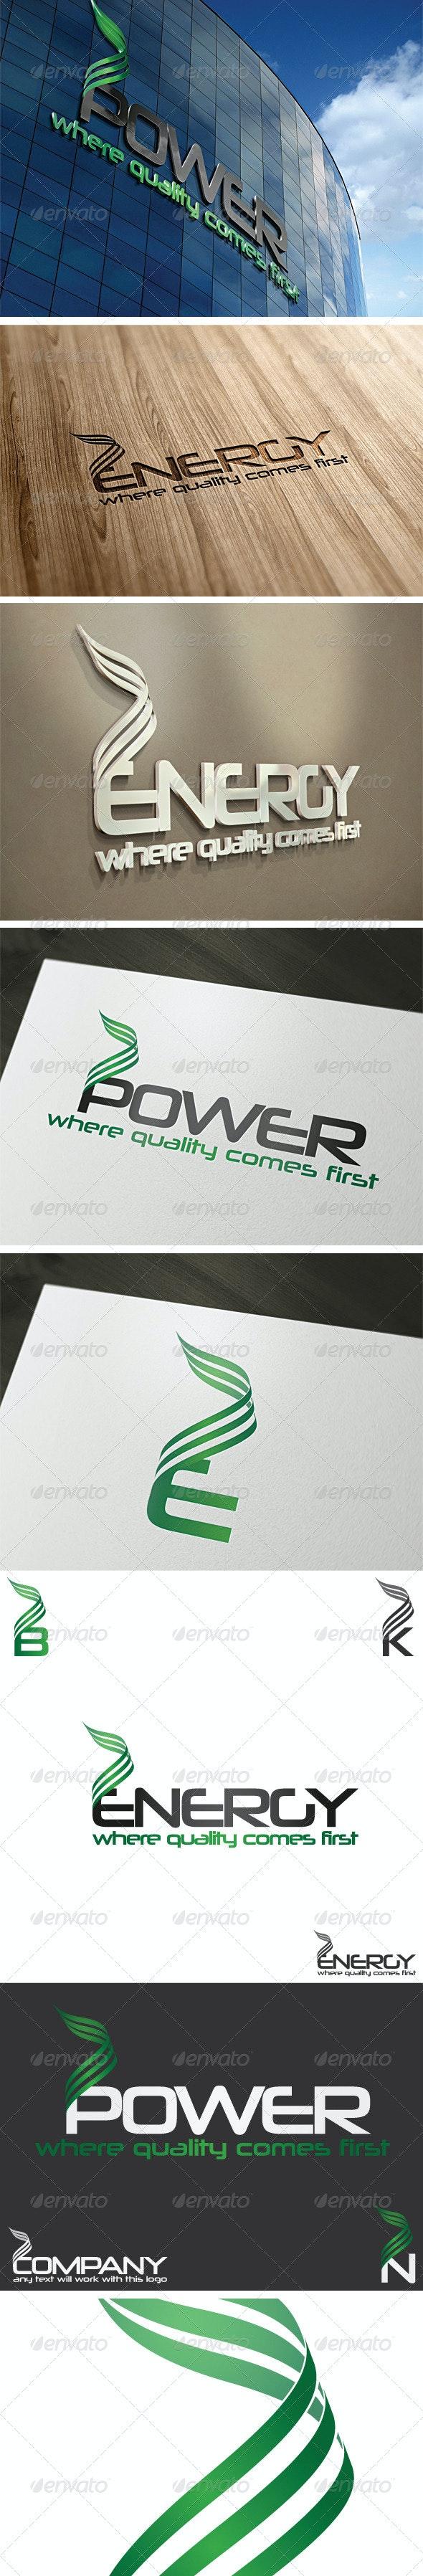 Energy Logo Template - Vector Abstract